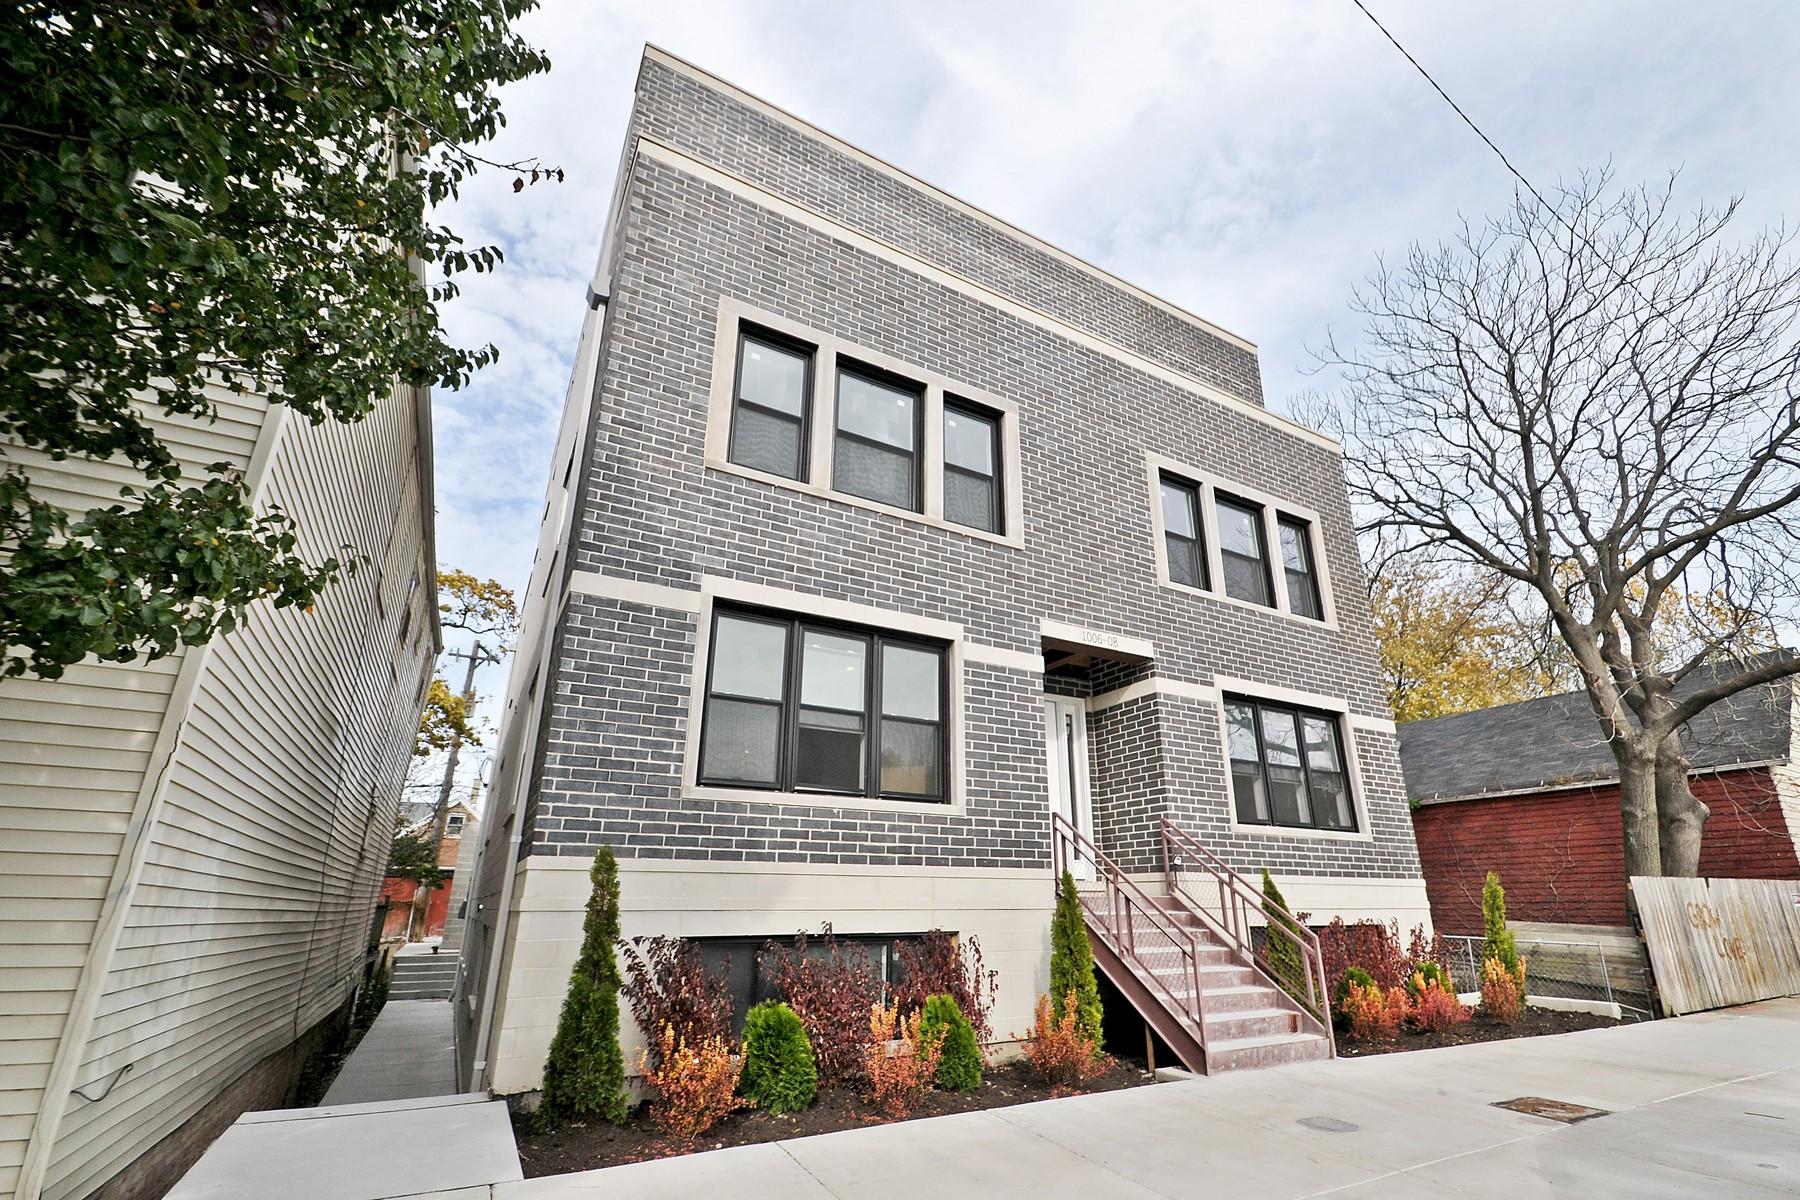 Property For Sale at Pilsen Art-District New Construction